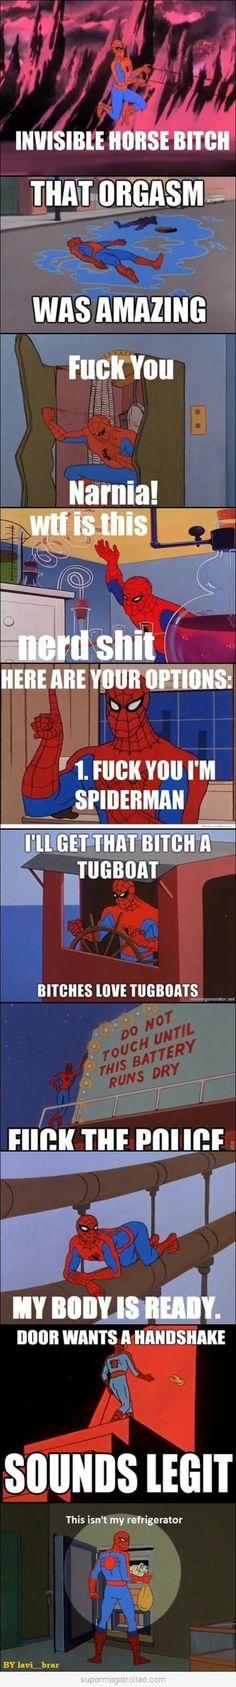 '60s Spiderman Meme